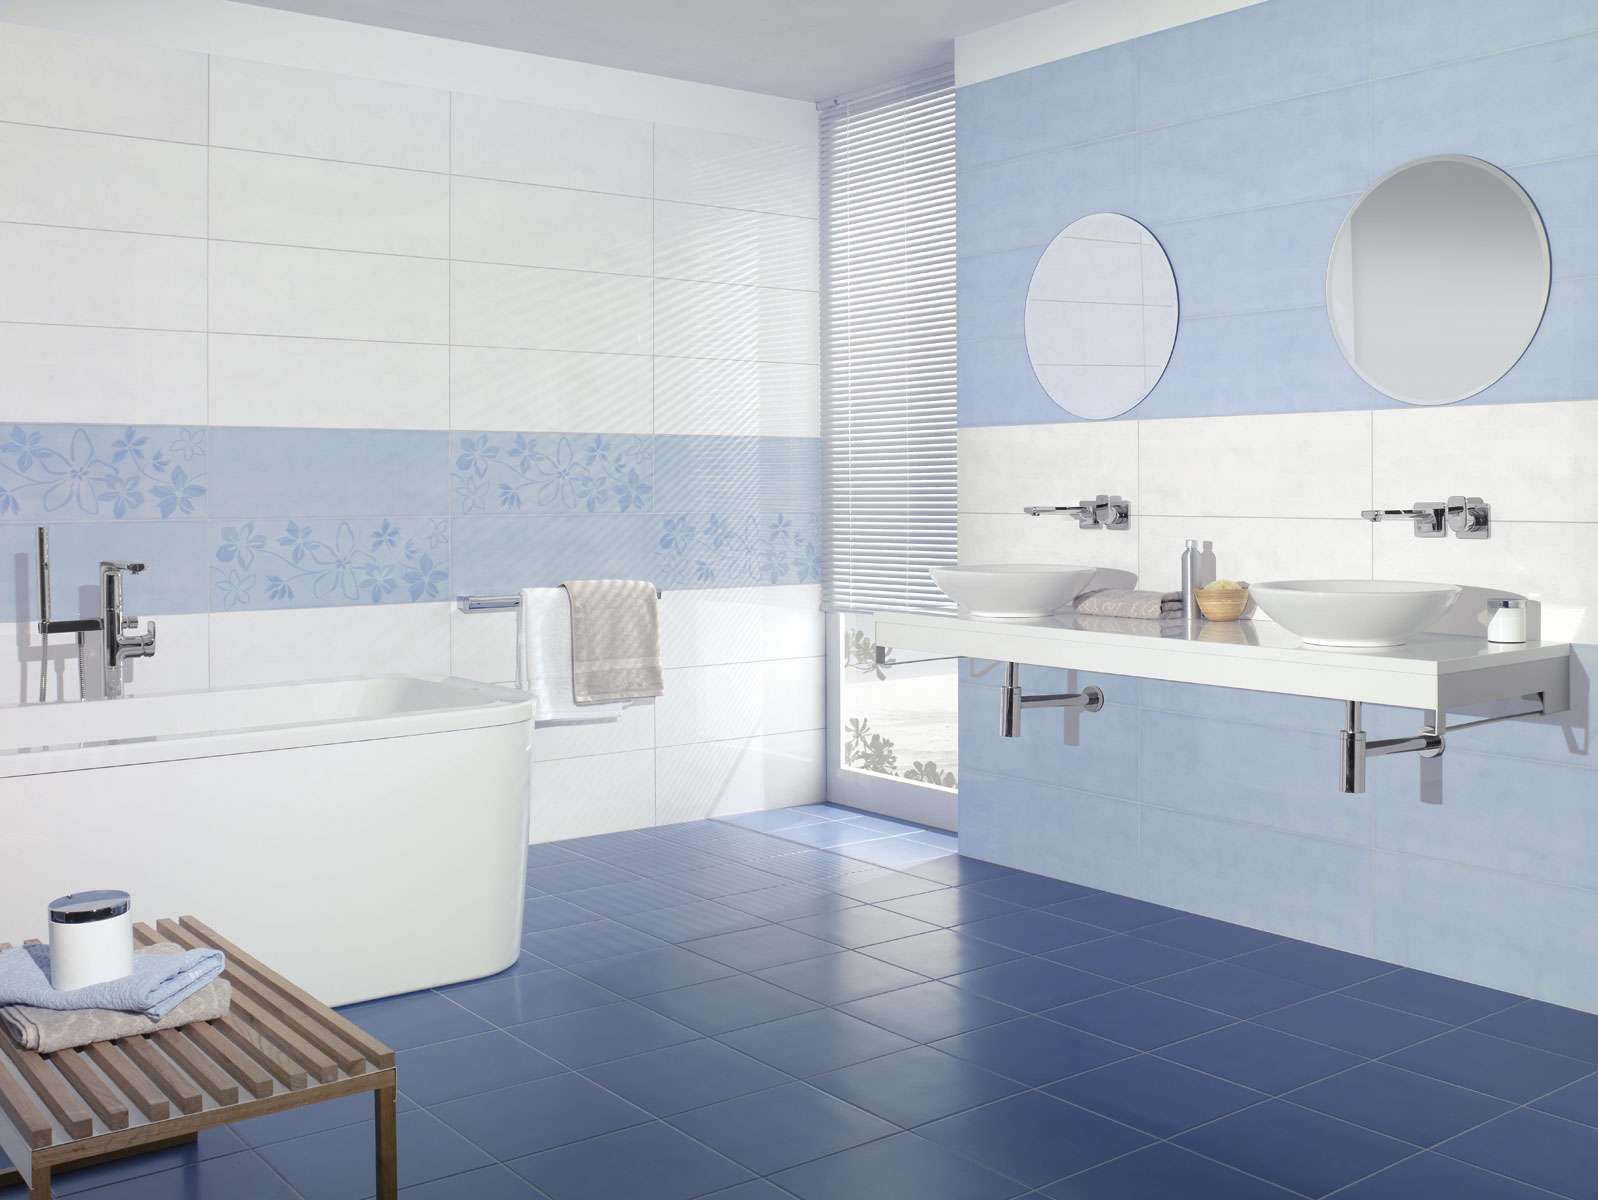 Carrelage mural bleu lagon - Atwebster.fr - Maison et mobilier